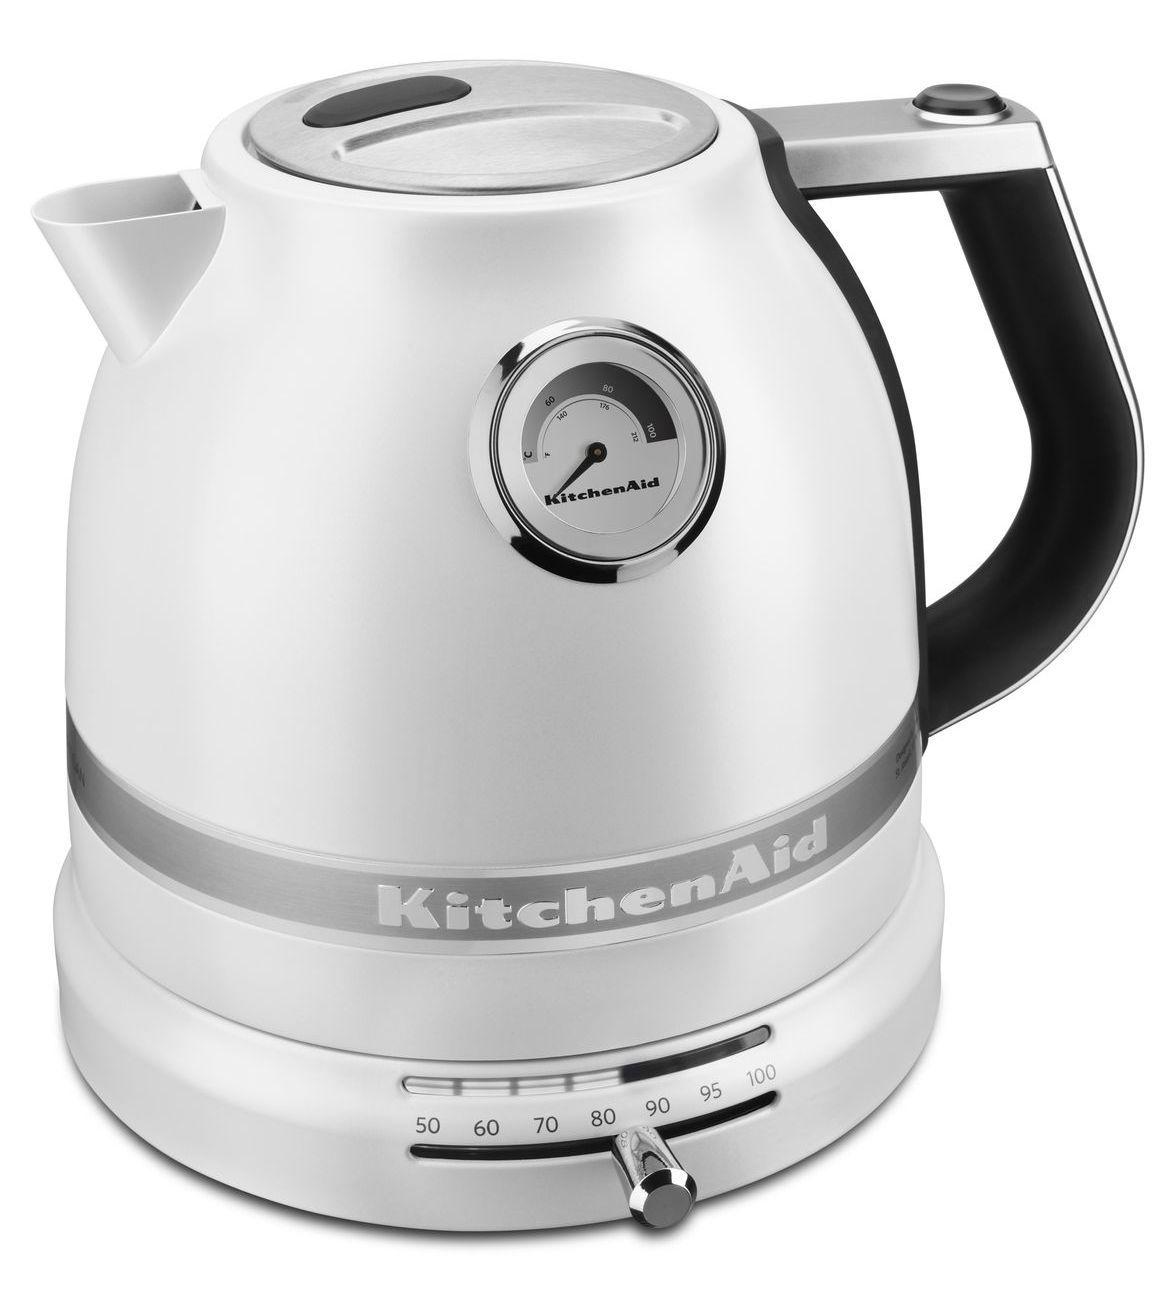 Kitchenaid Water Kettle